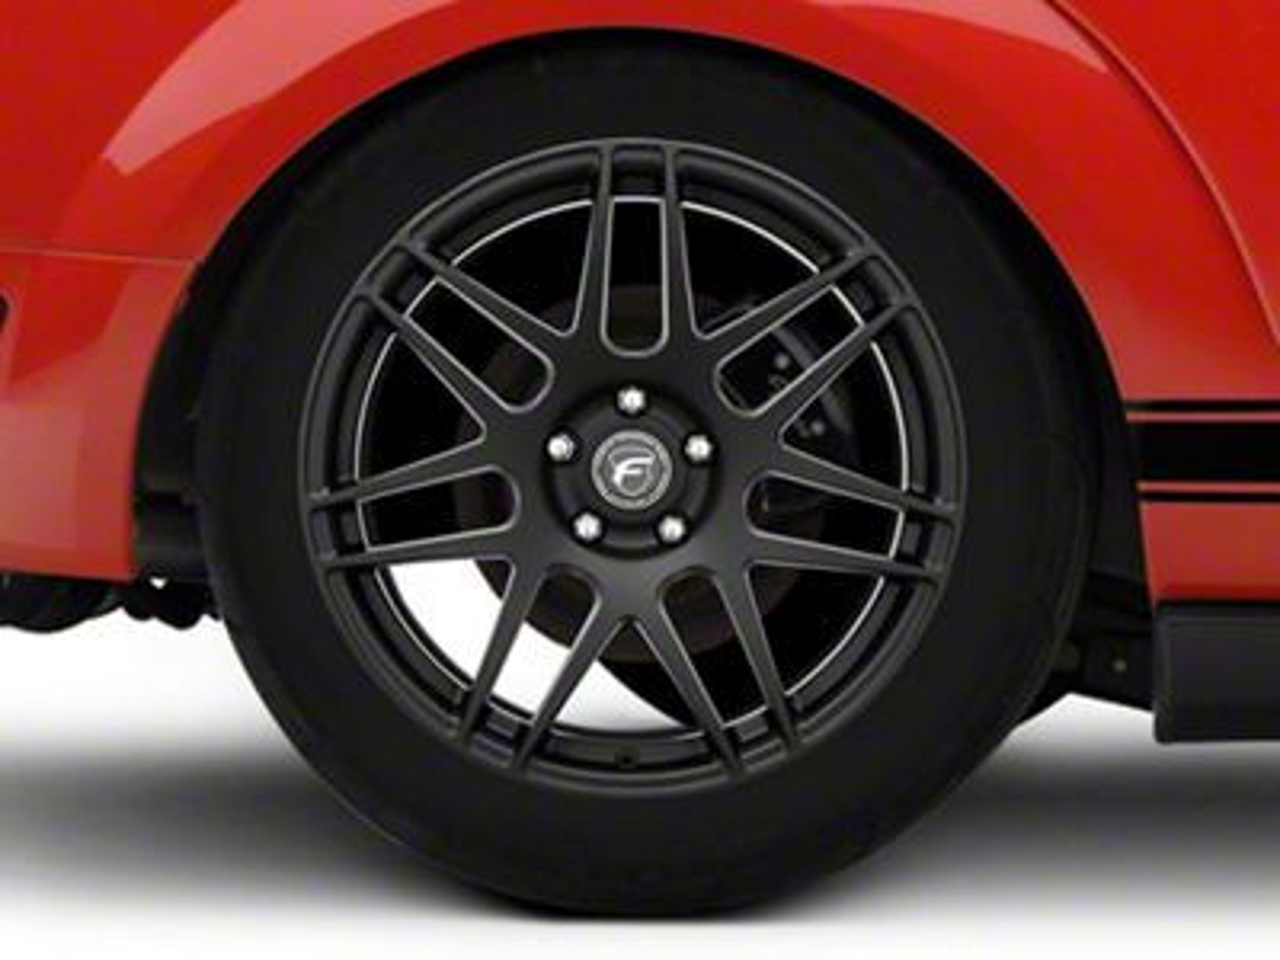 Forgestar F14 Monoblock Matte Black Wheel - 19x11 - Rear Only (05-14 All)